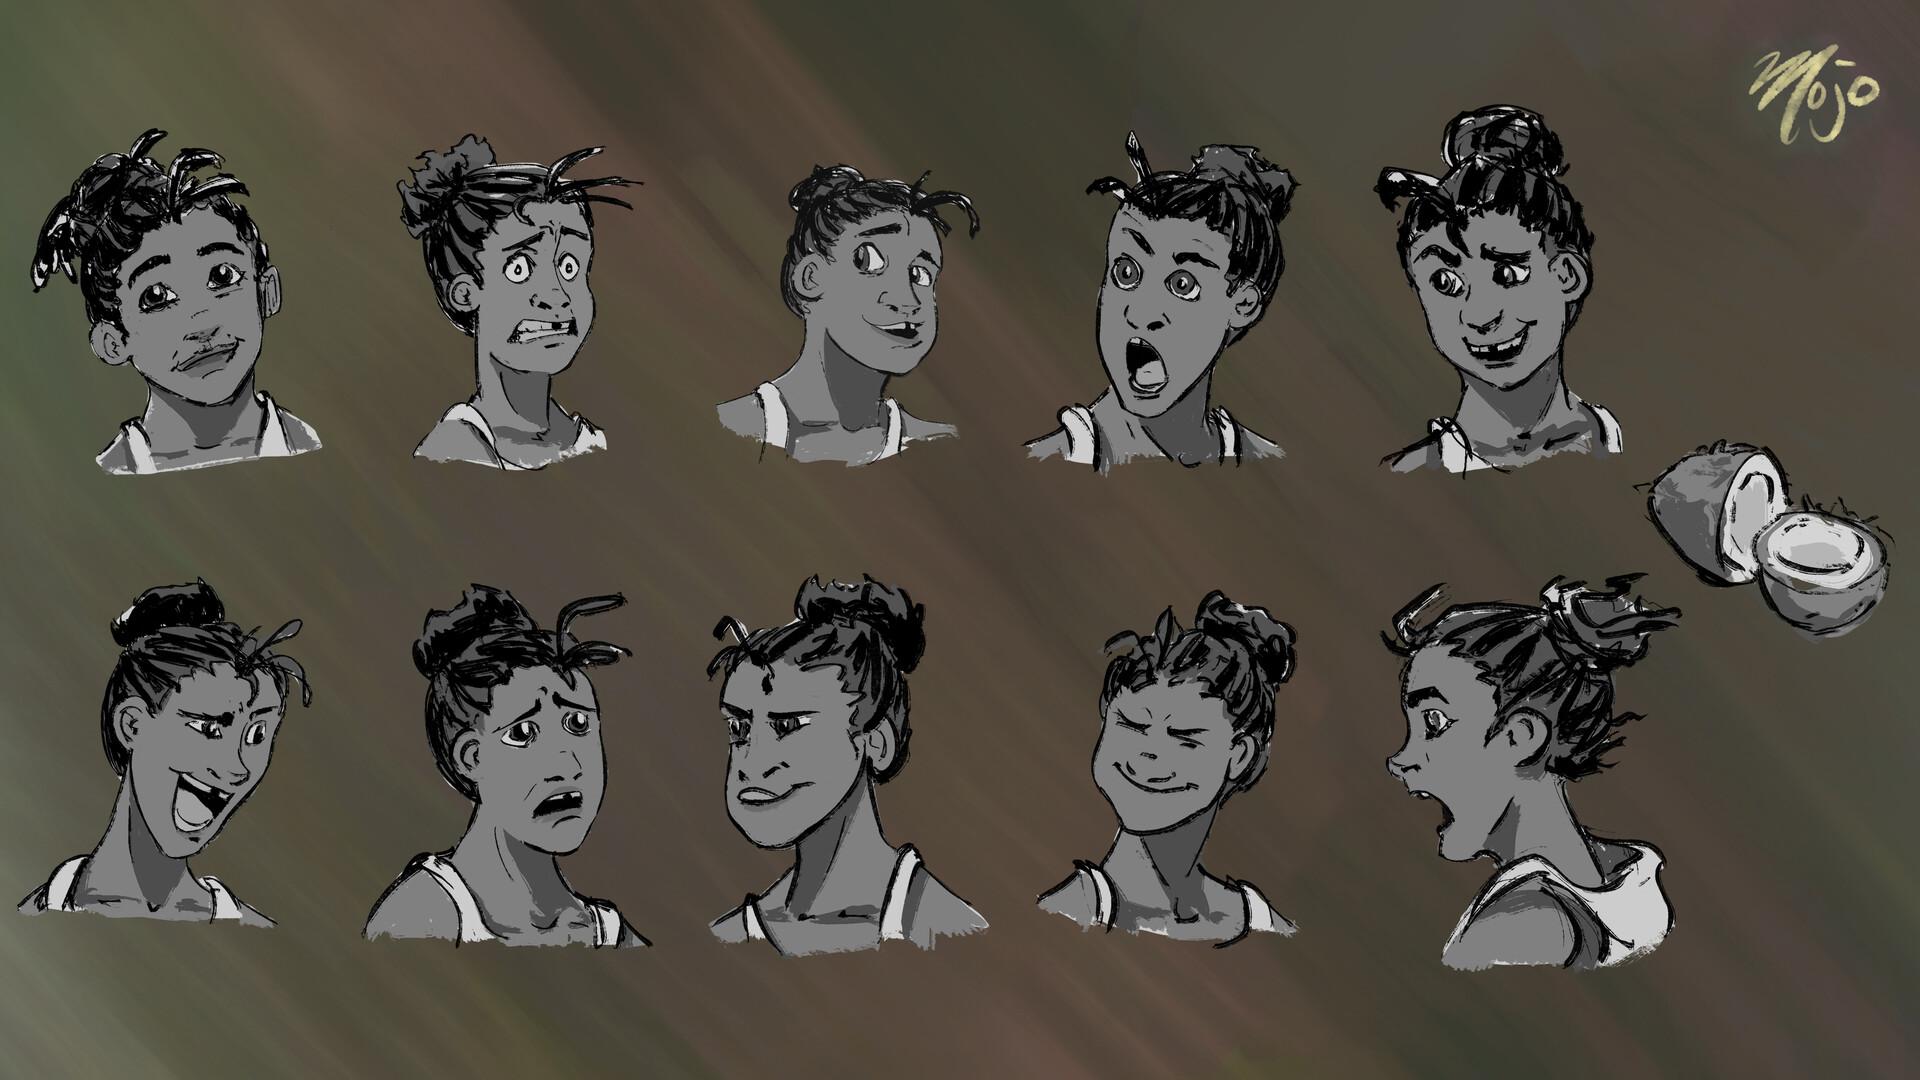 Mojo expressions